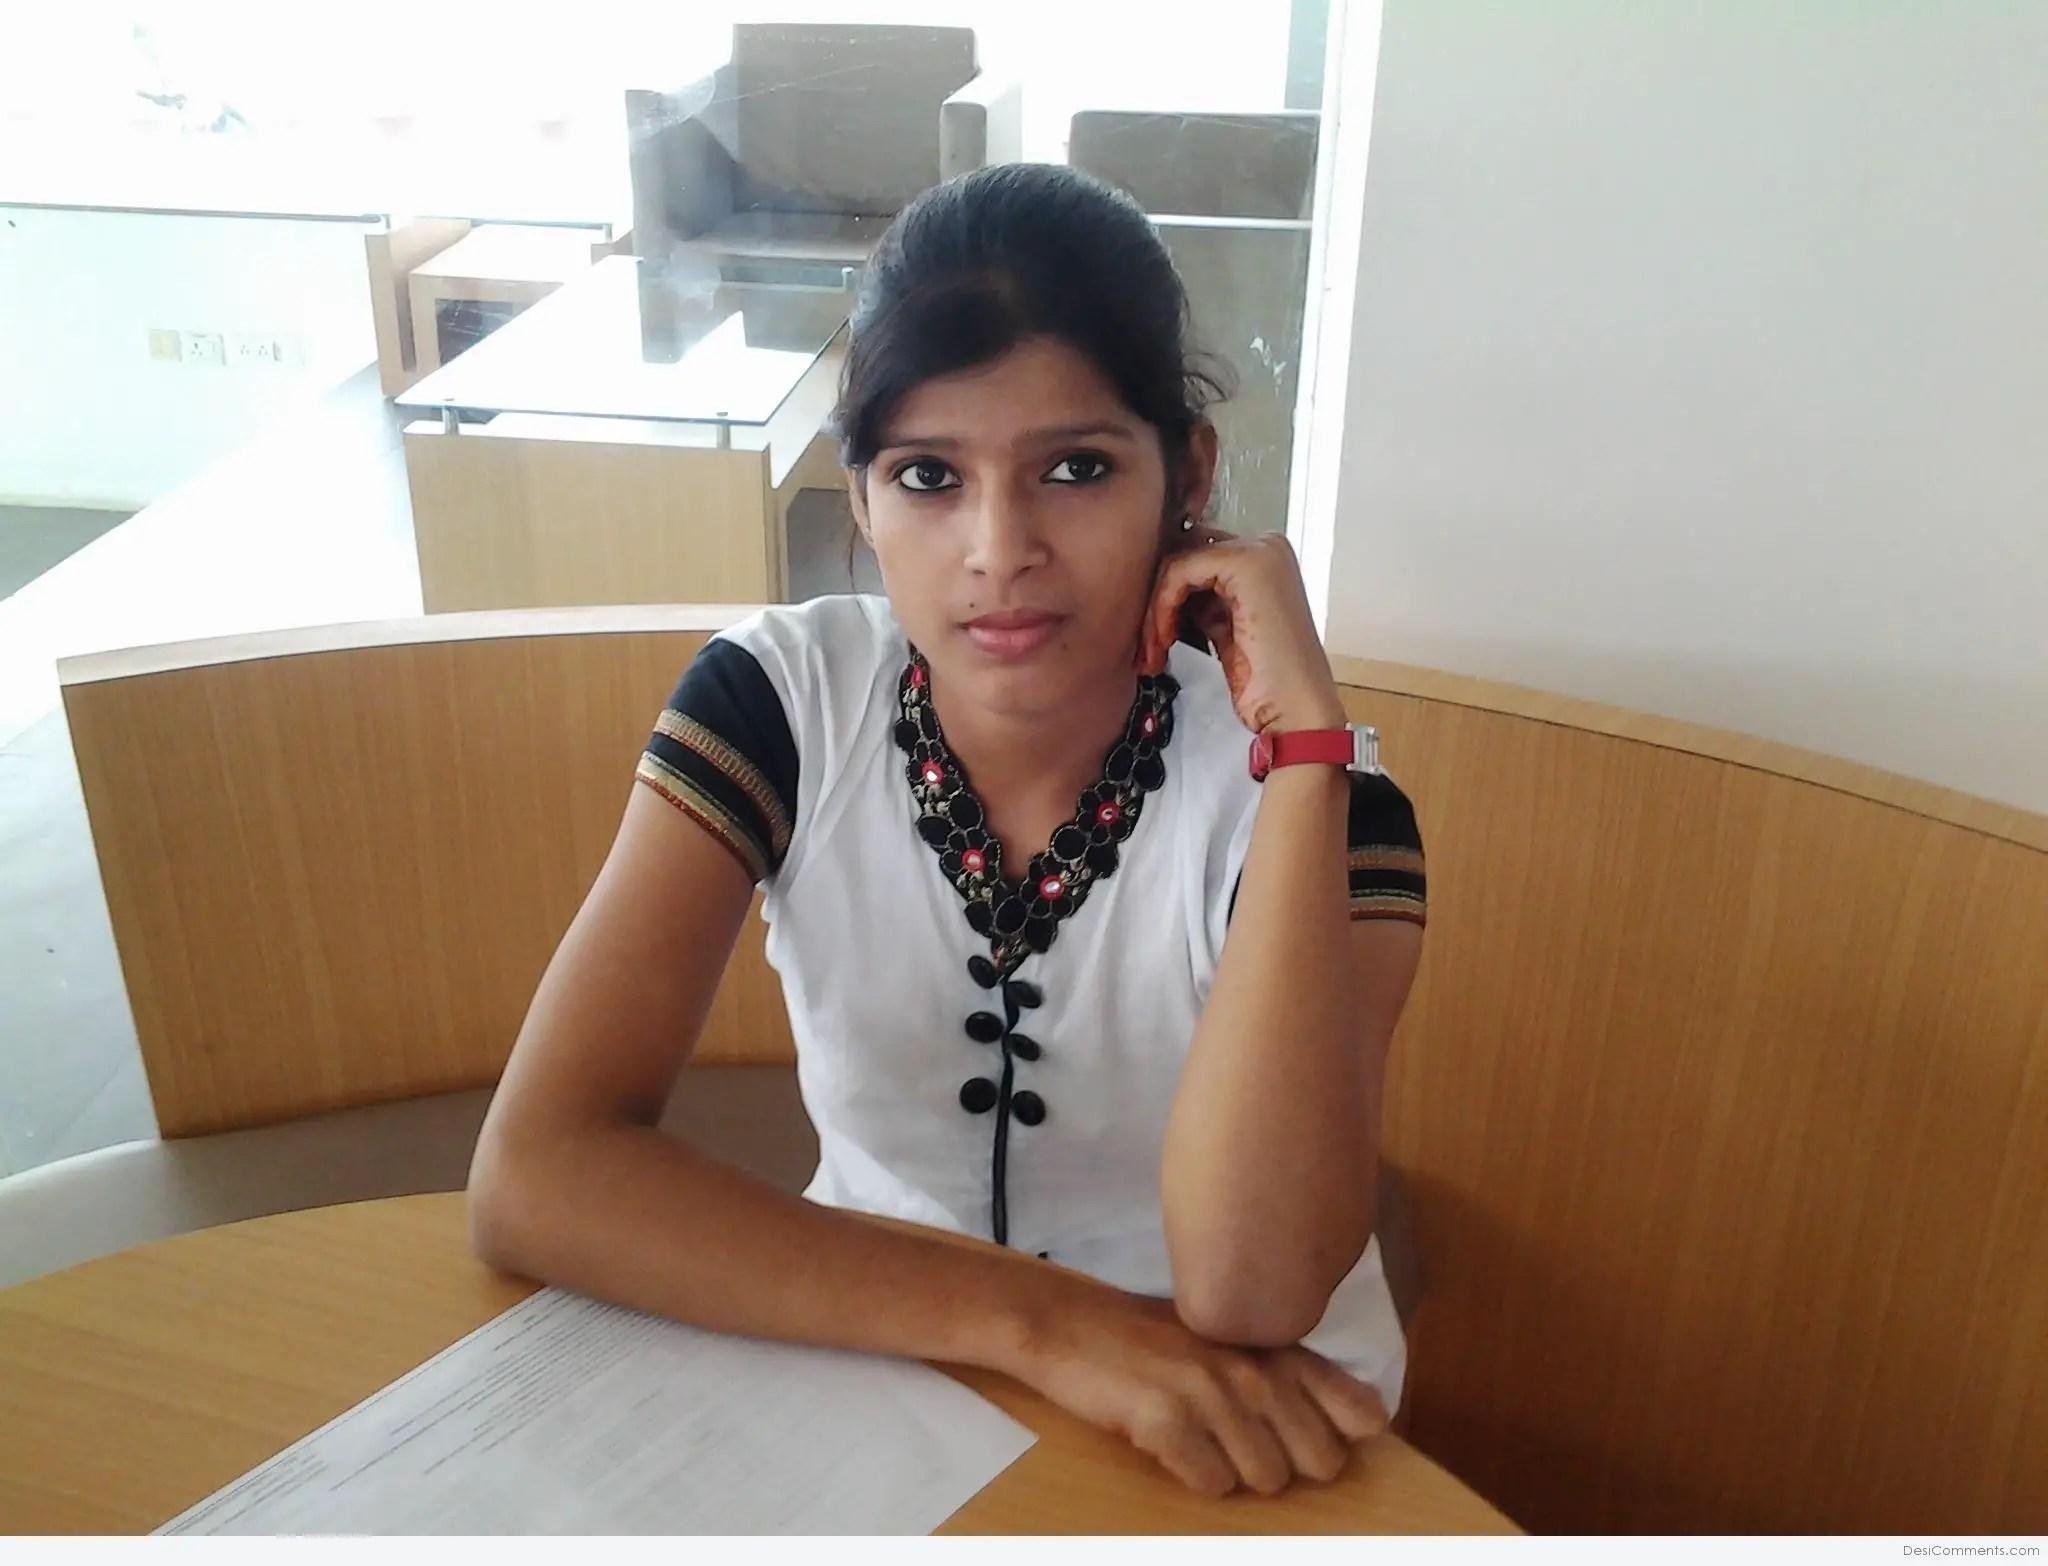 Punjabi Boy And Girl Wallpaper Beautiful Indian Girl Desicomments Com